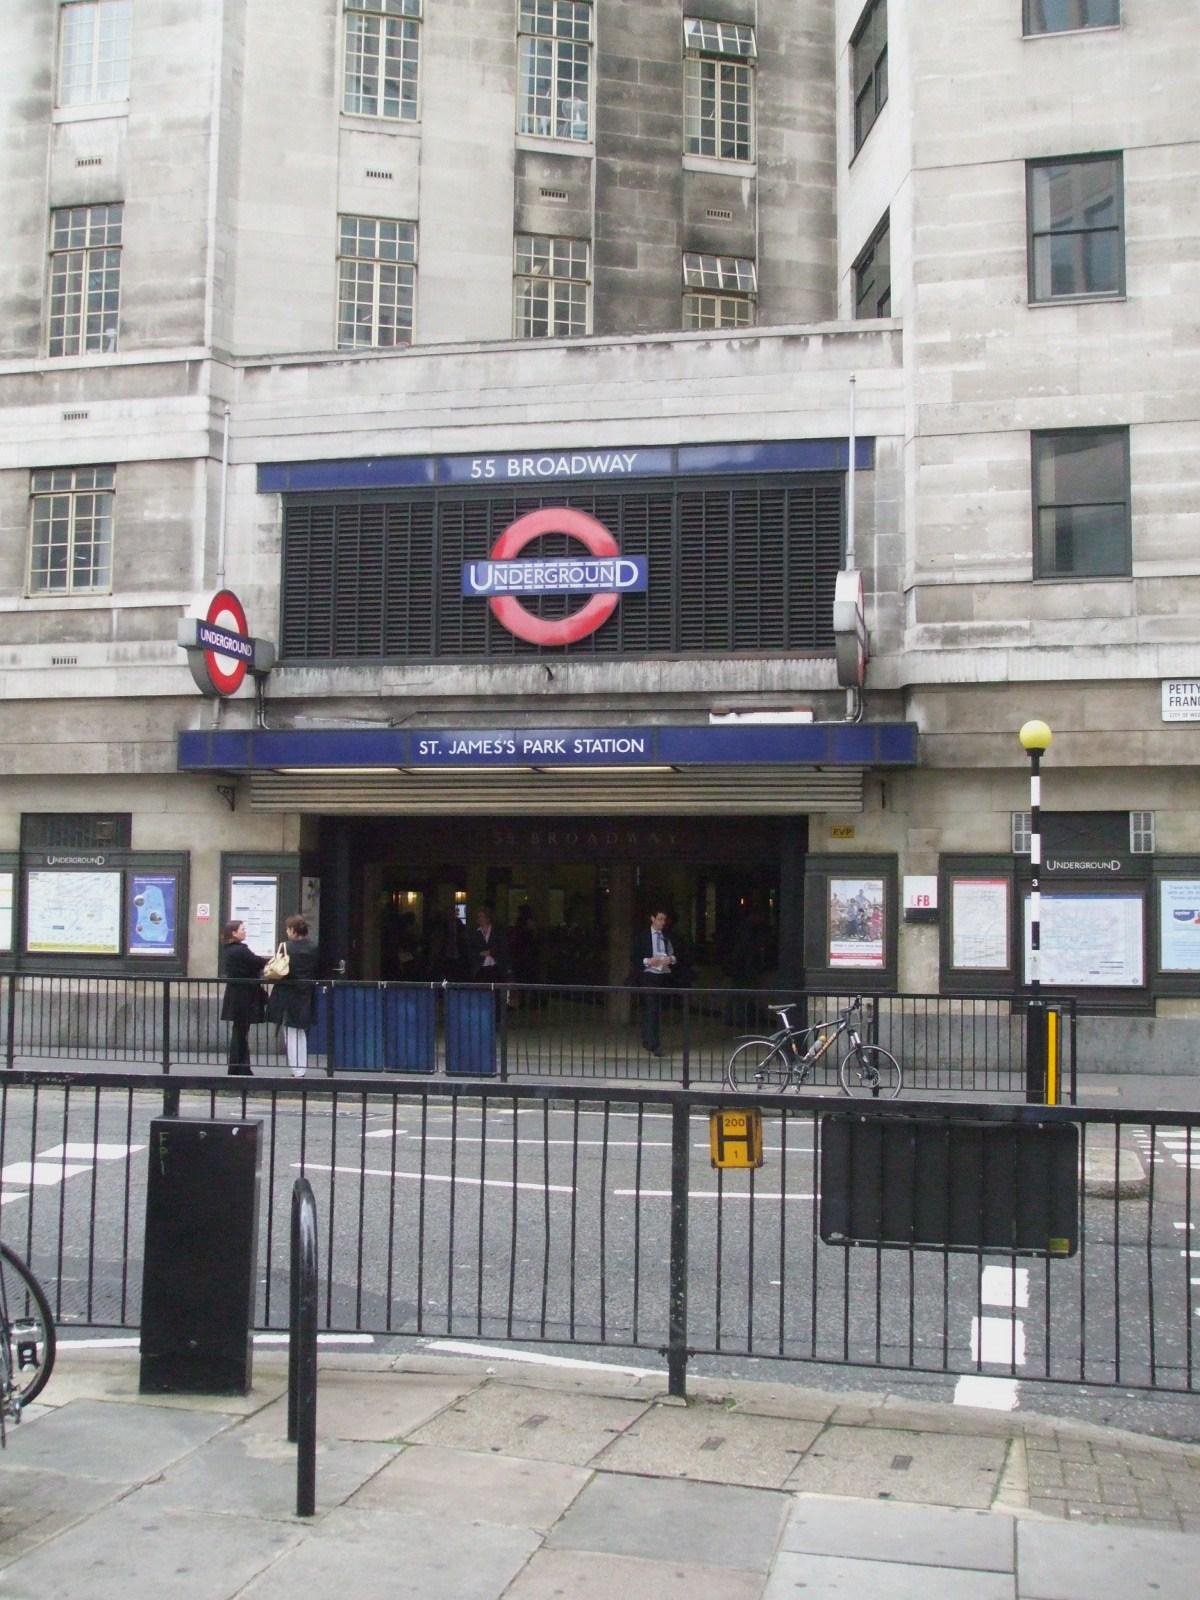 St. James's Park tube station - Wikipedia